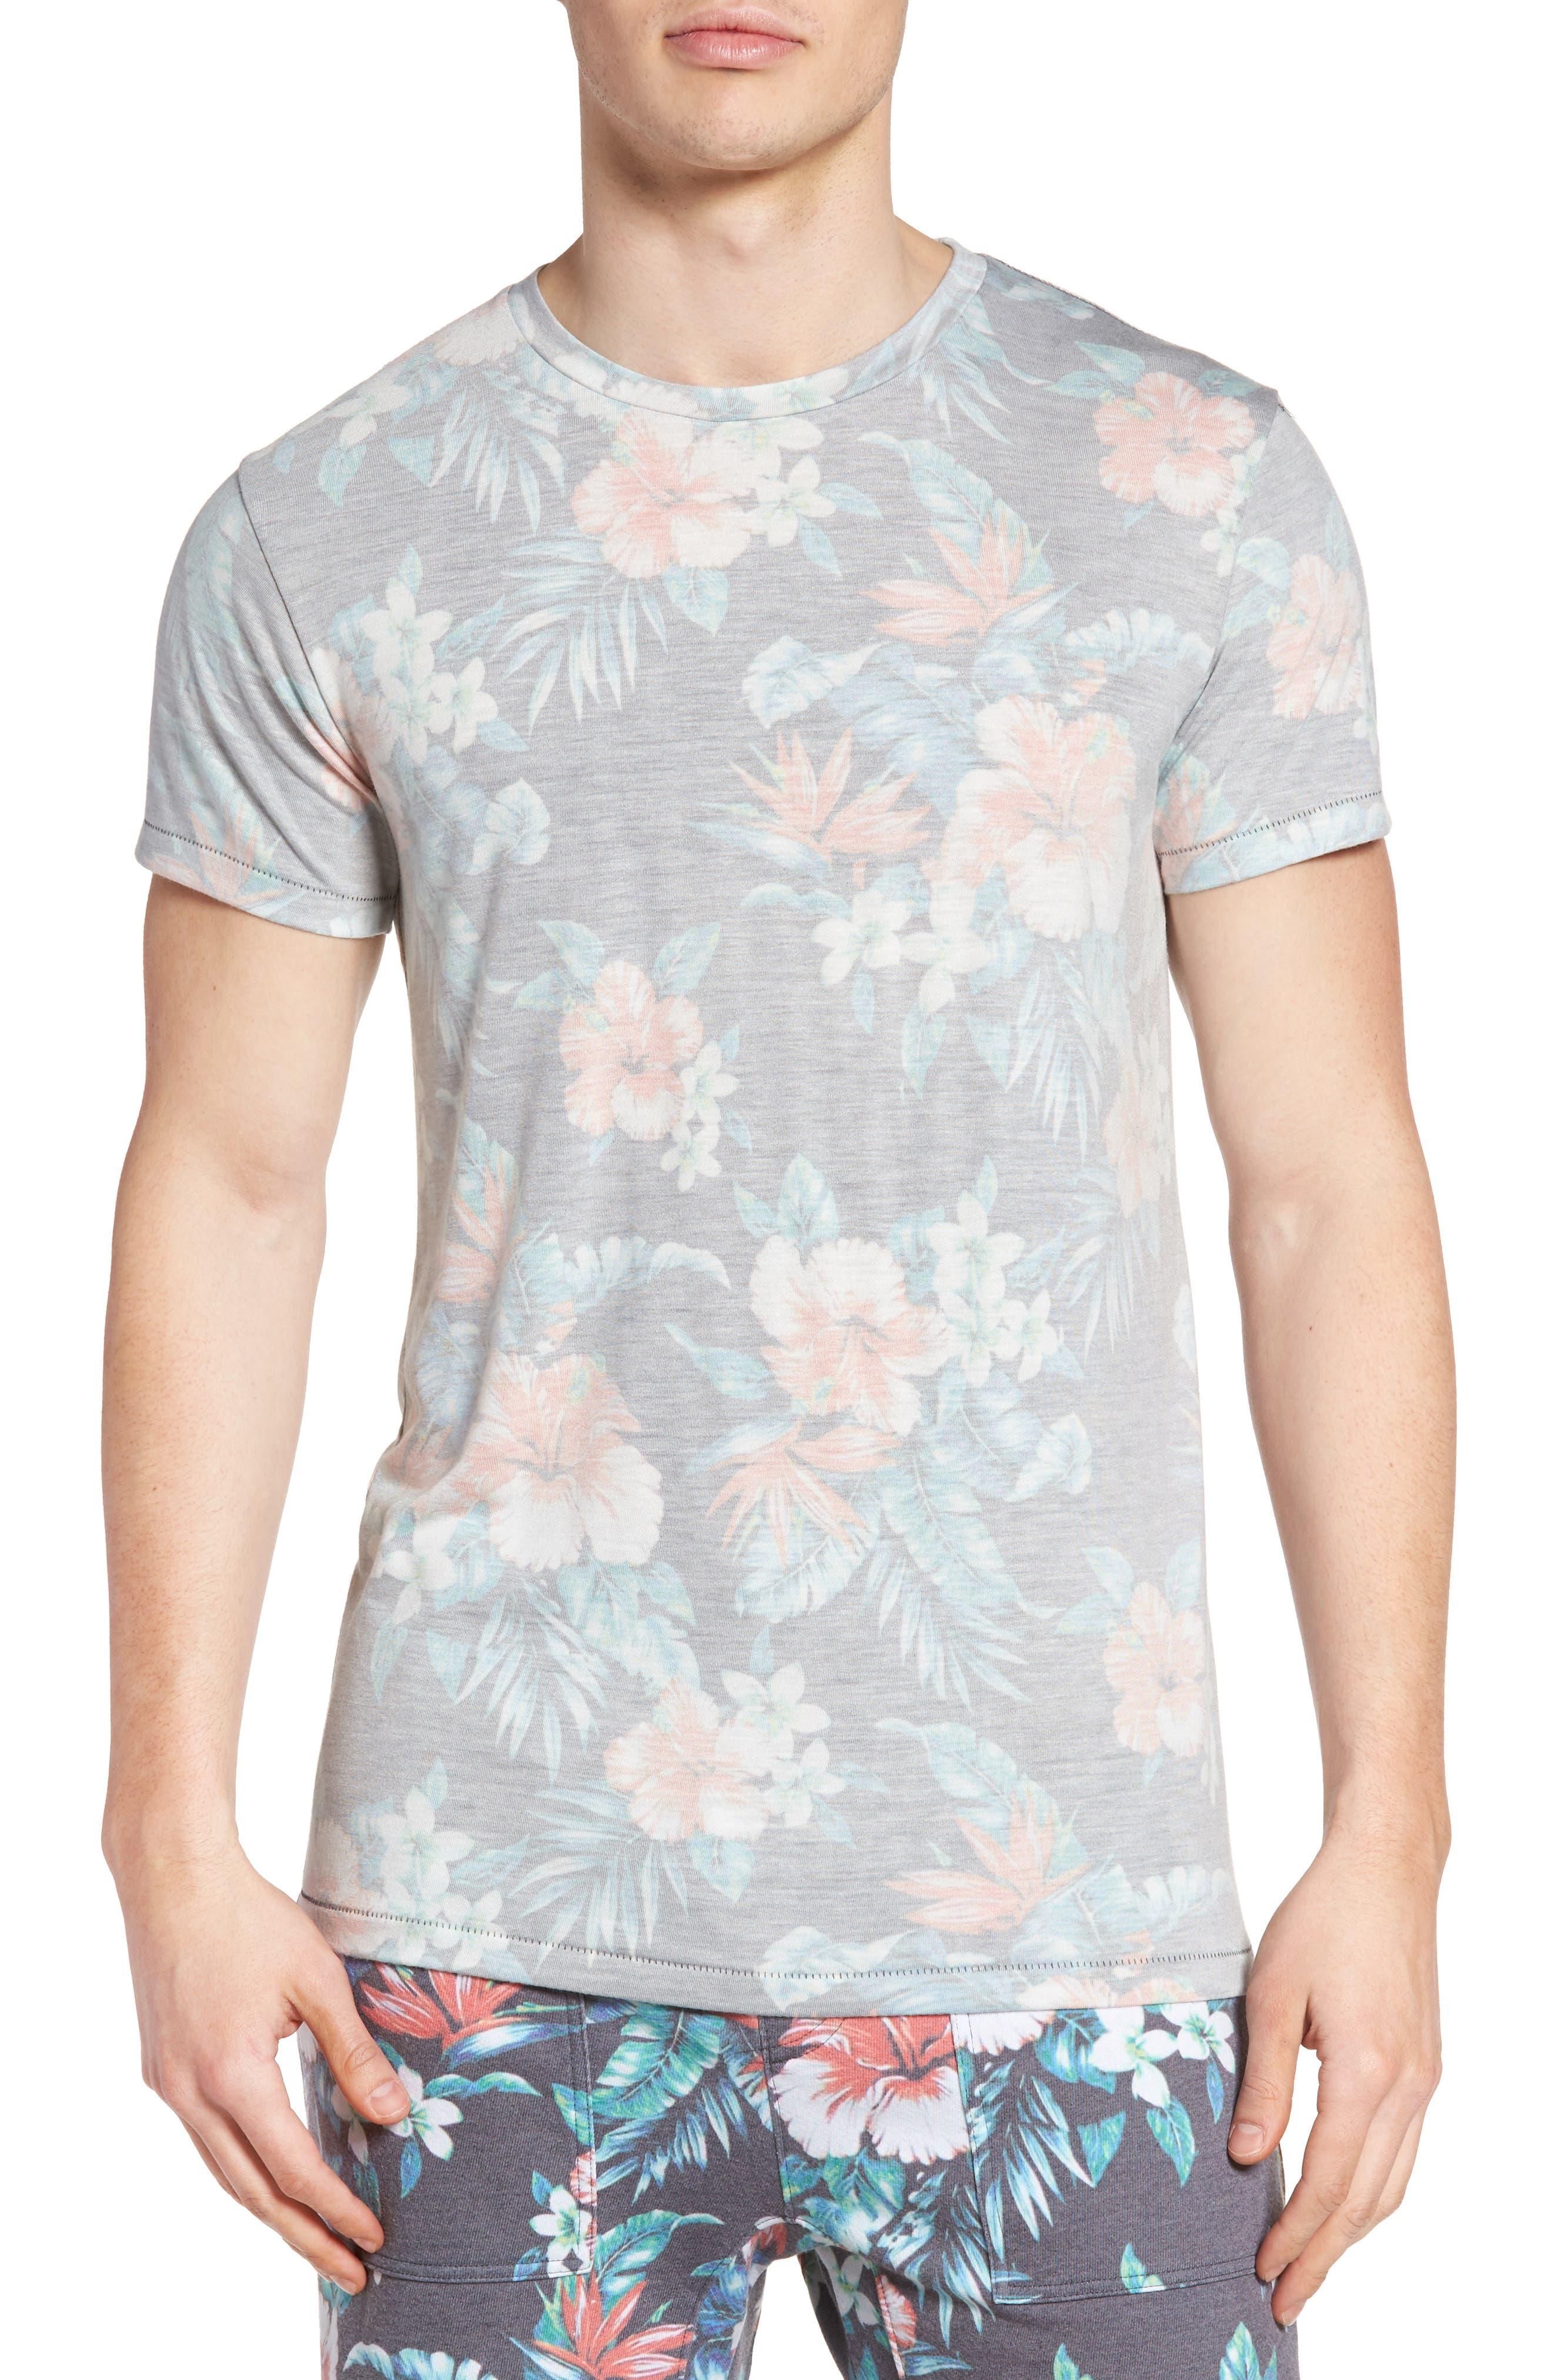 Sol Angeles Palmita Floral Print T-Shirt